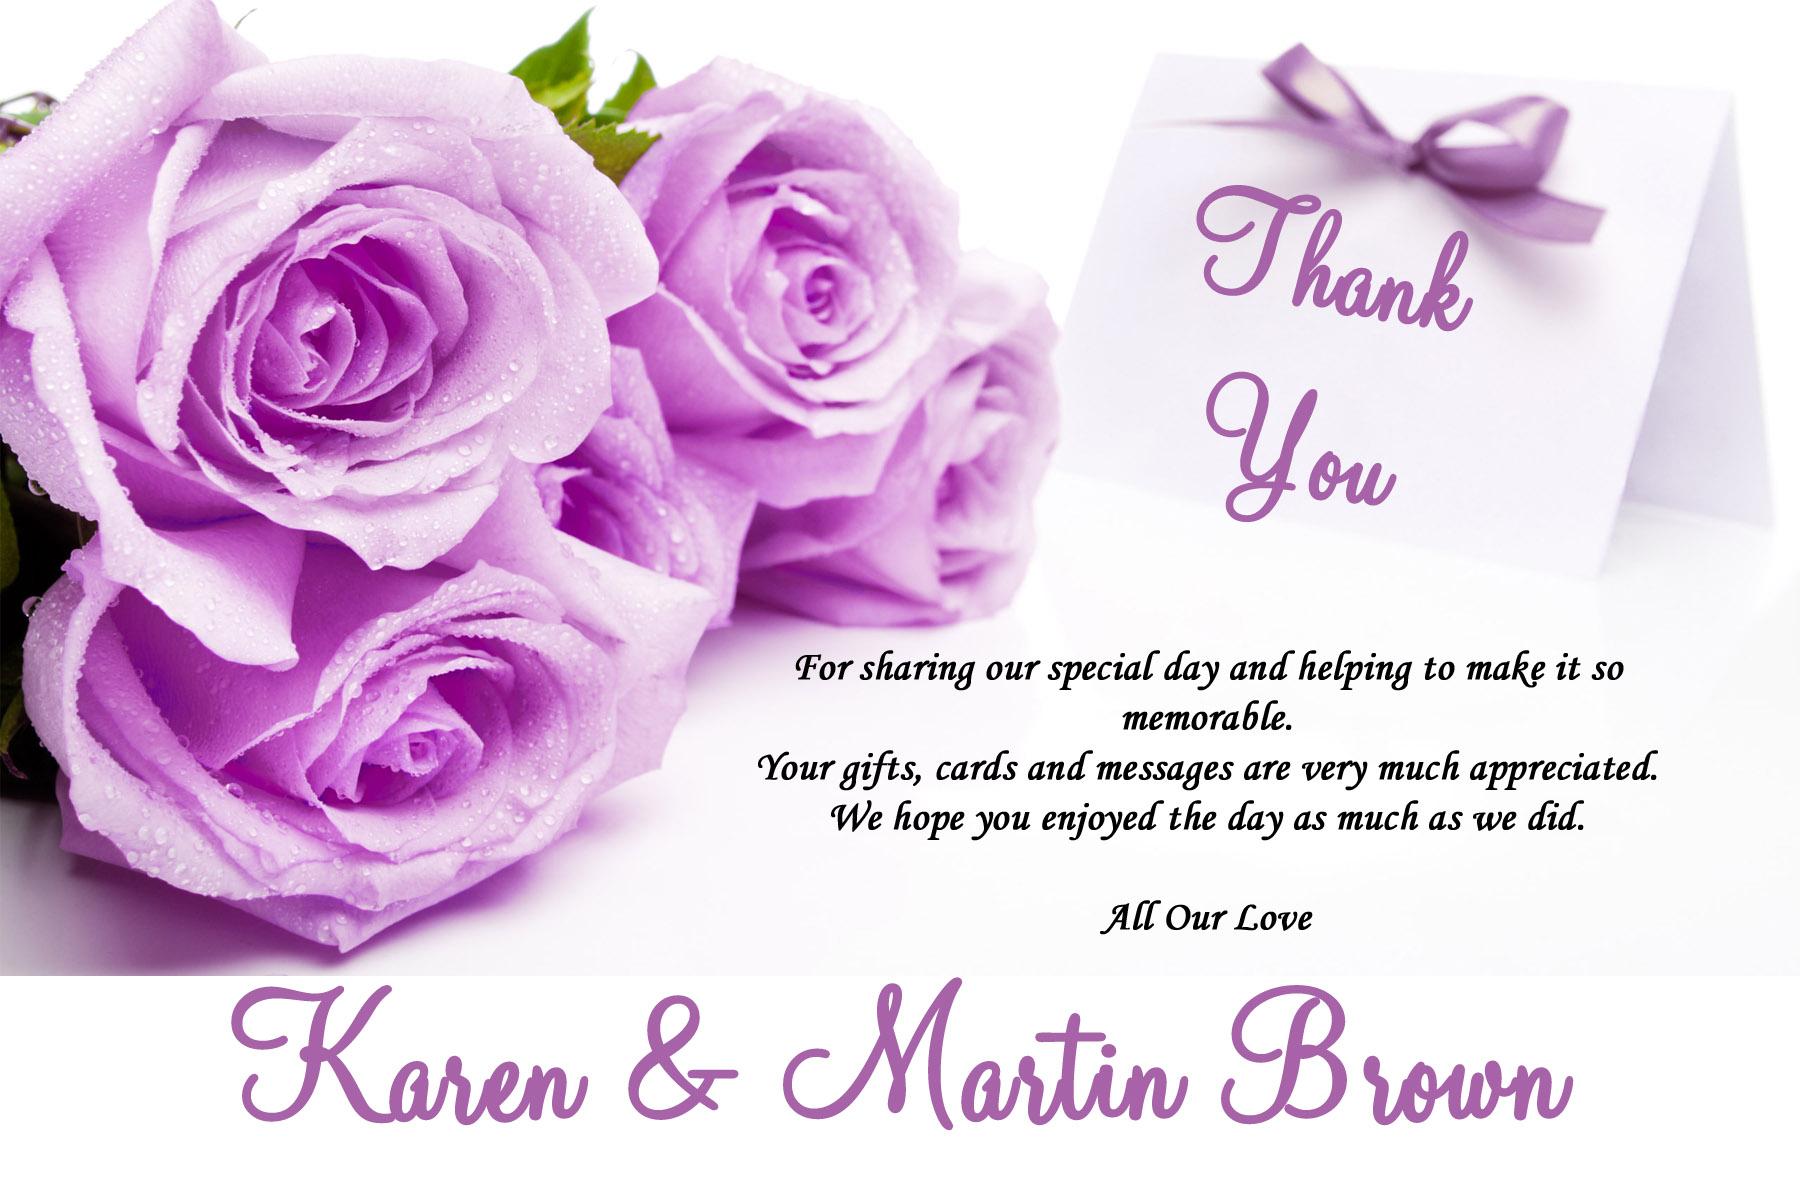 Wedding Invitation Thank You Card Wording Wedding Invitation Ideas – Thank You Card Template Word